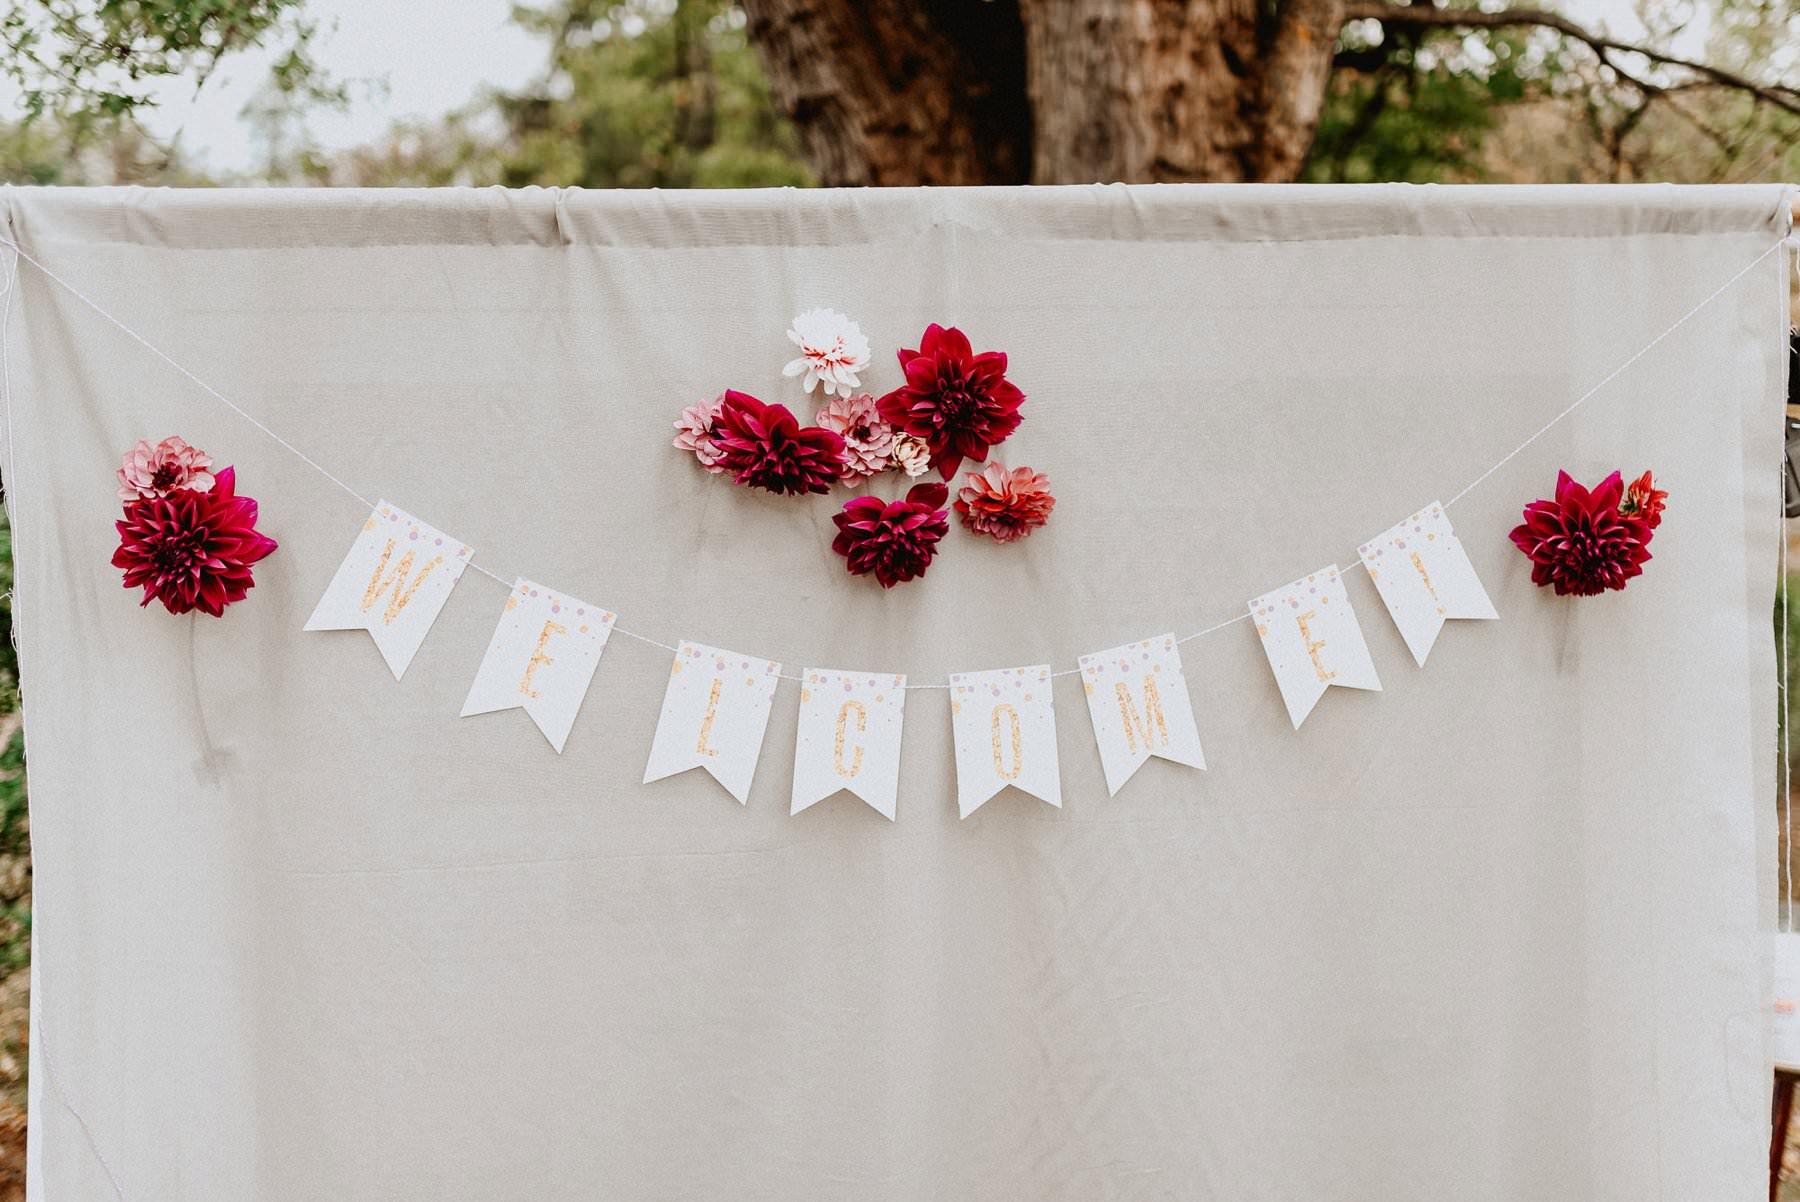 John_James_Audubon_Center_wedding-36.jpg